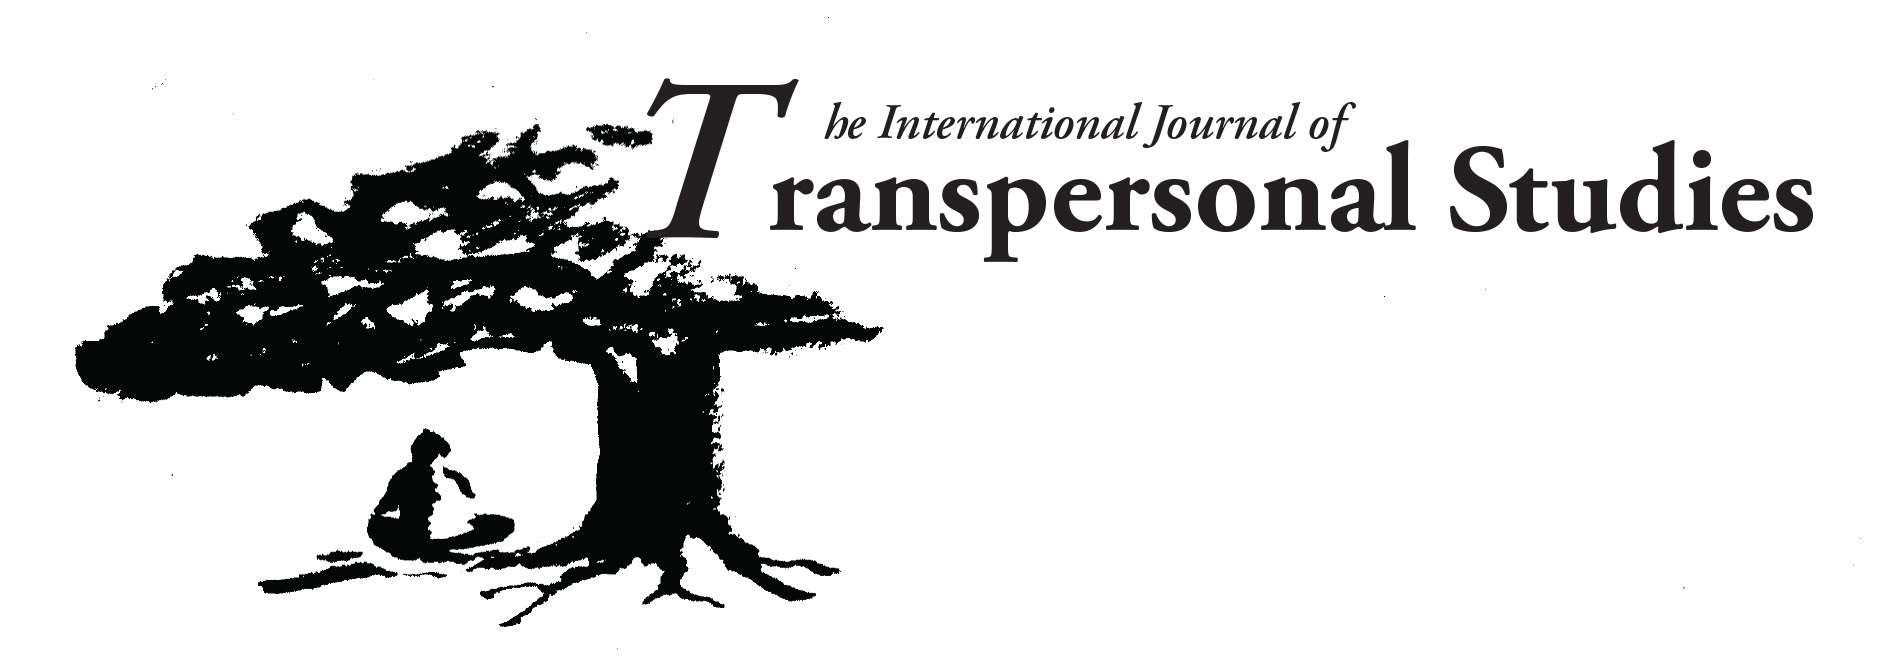 Transpersonal Psychology Information Guide